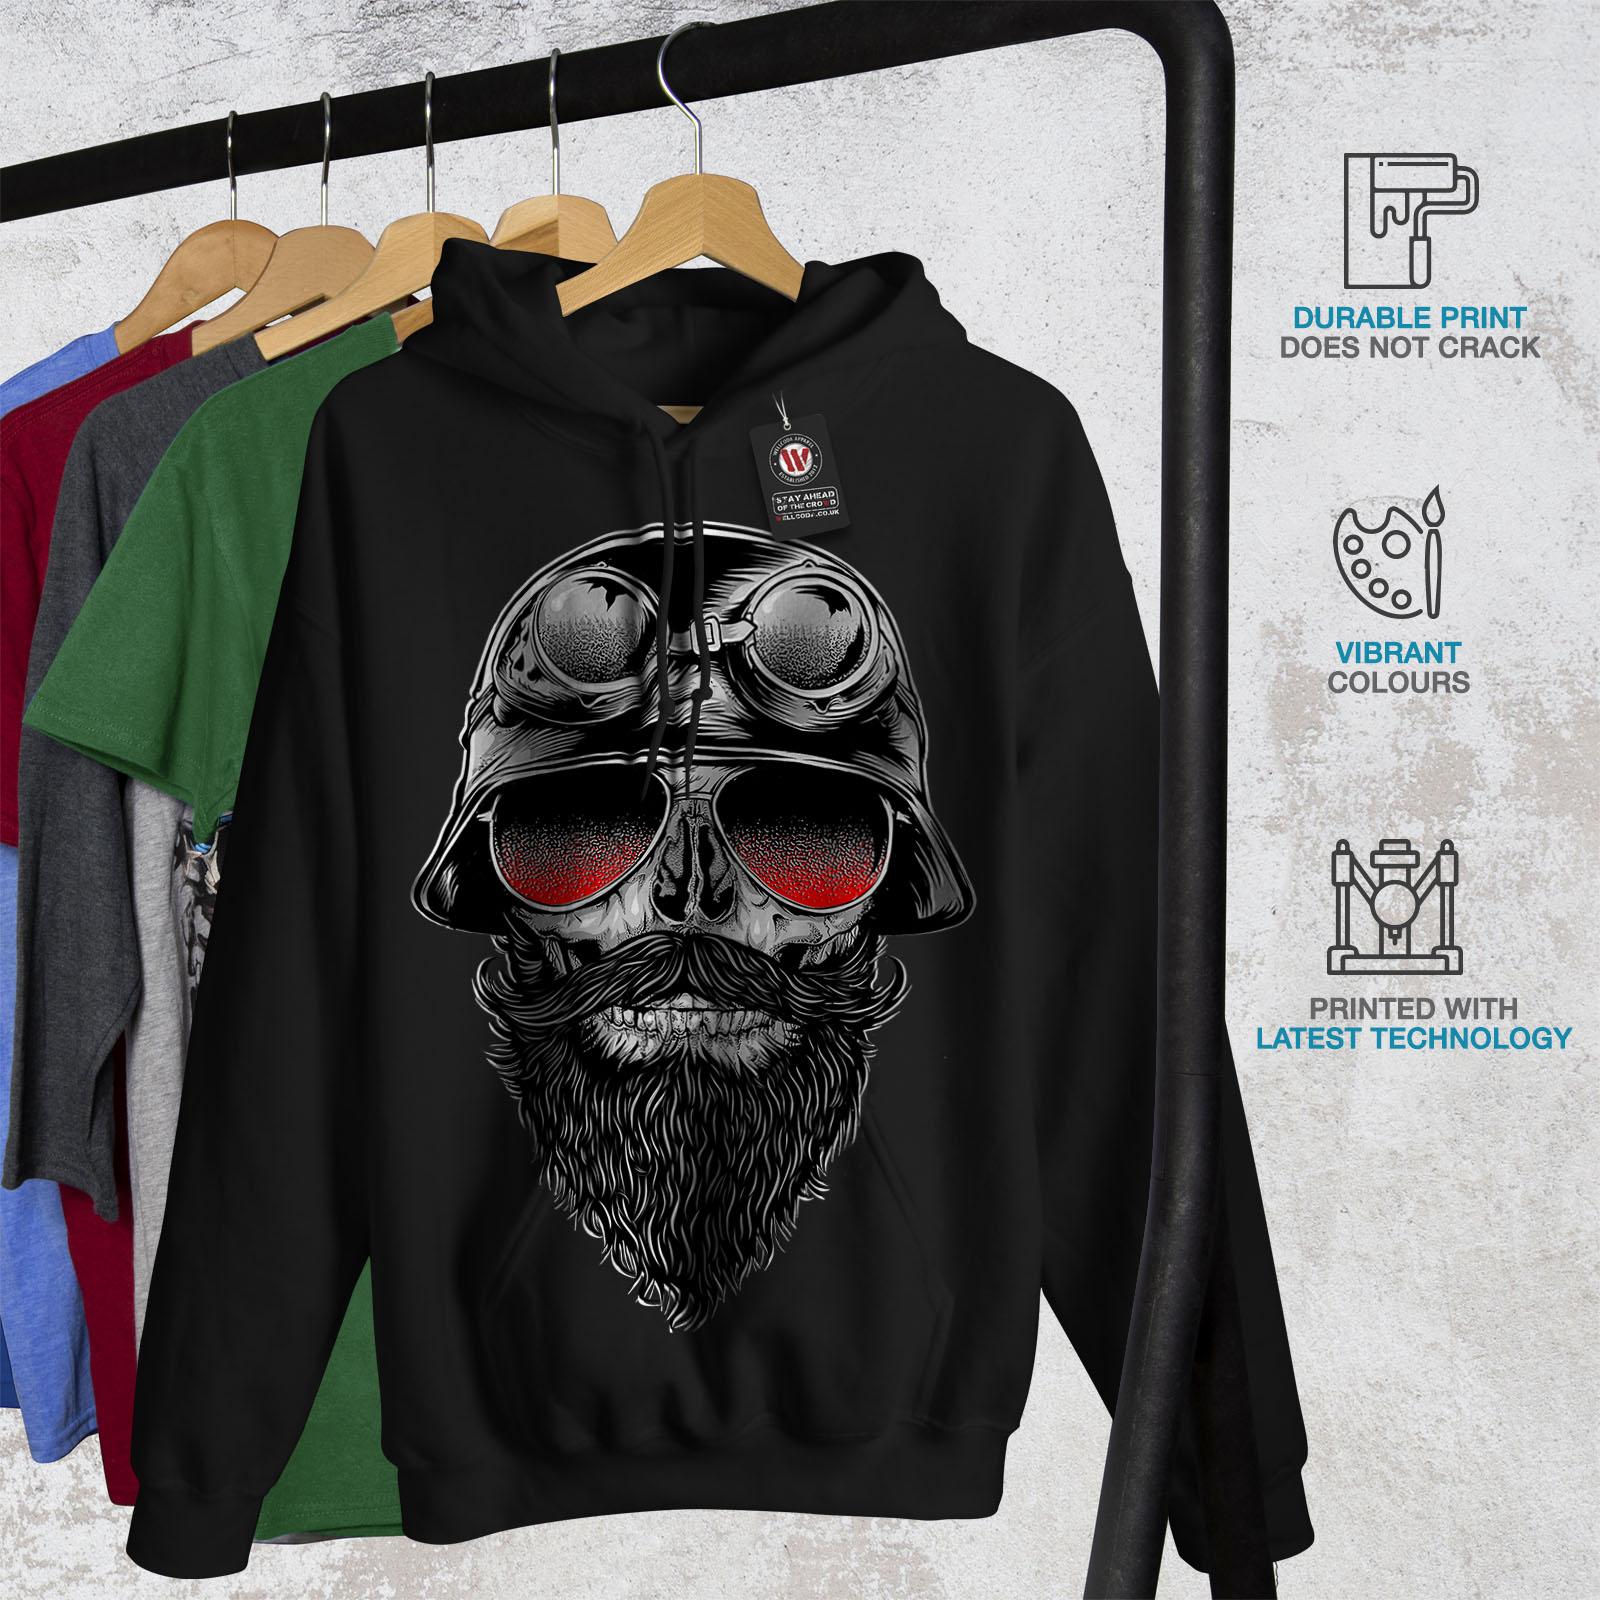 Wellcoda New Mens Hoodie New Casual Hooded Sweatshirt